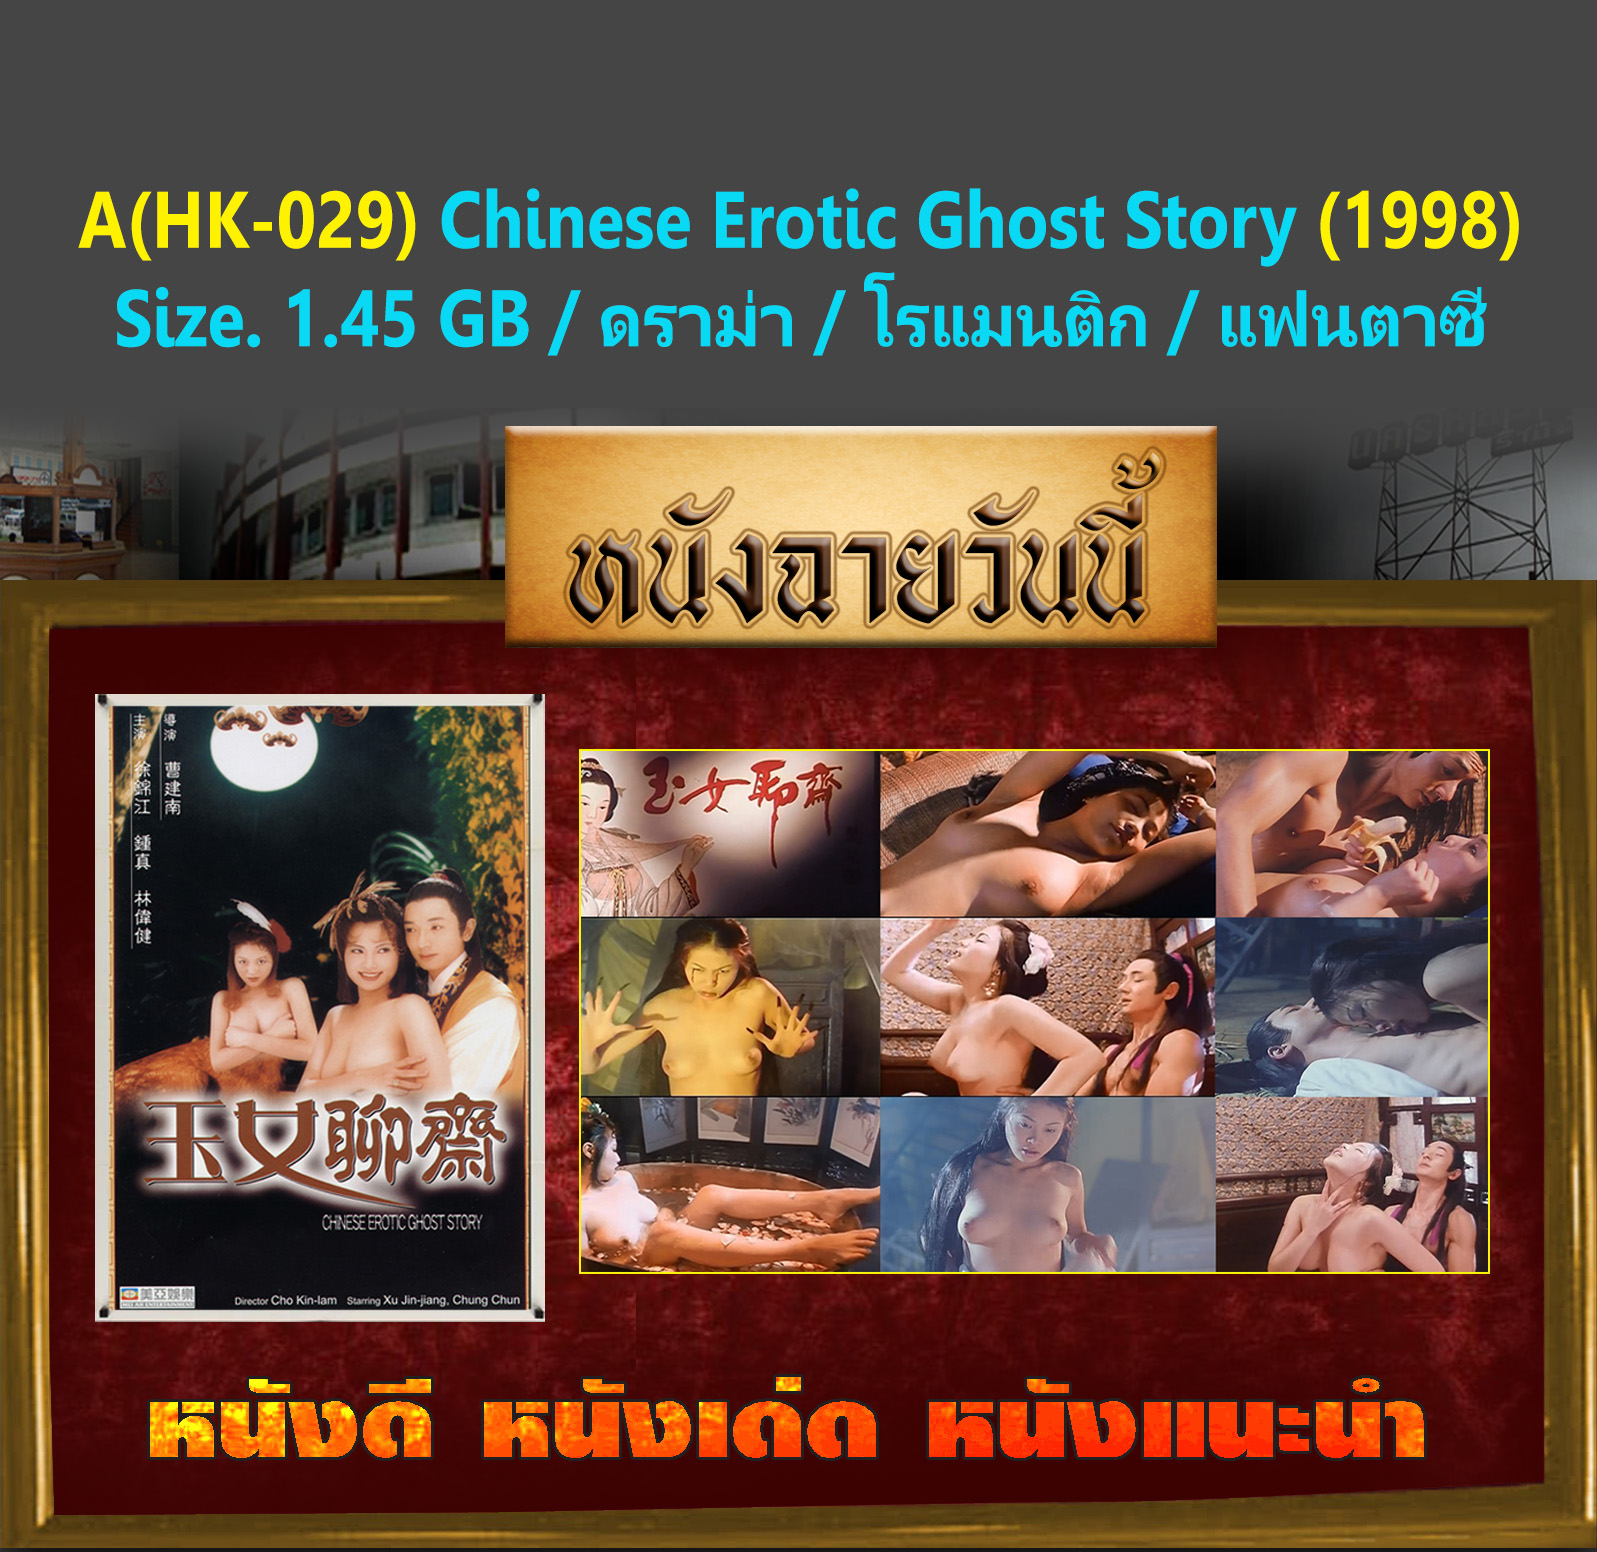 Chinese erotic ghost story ii